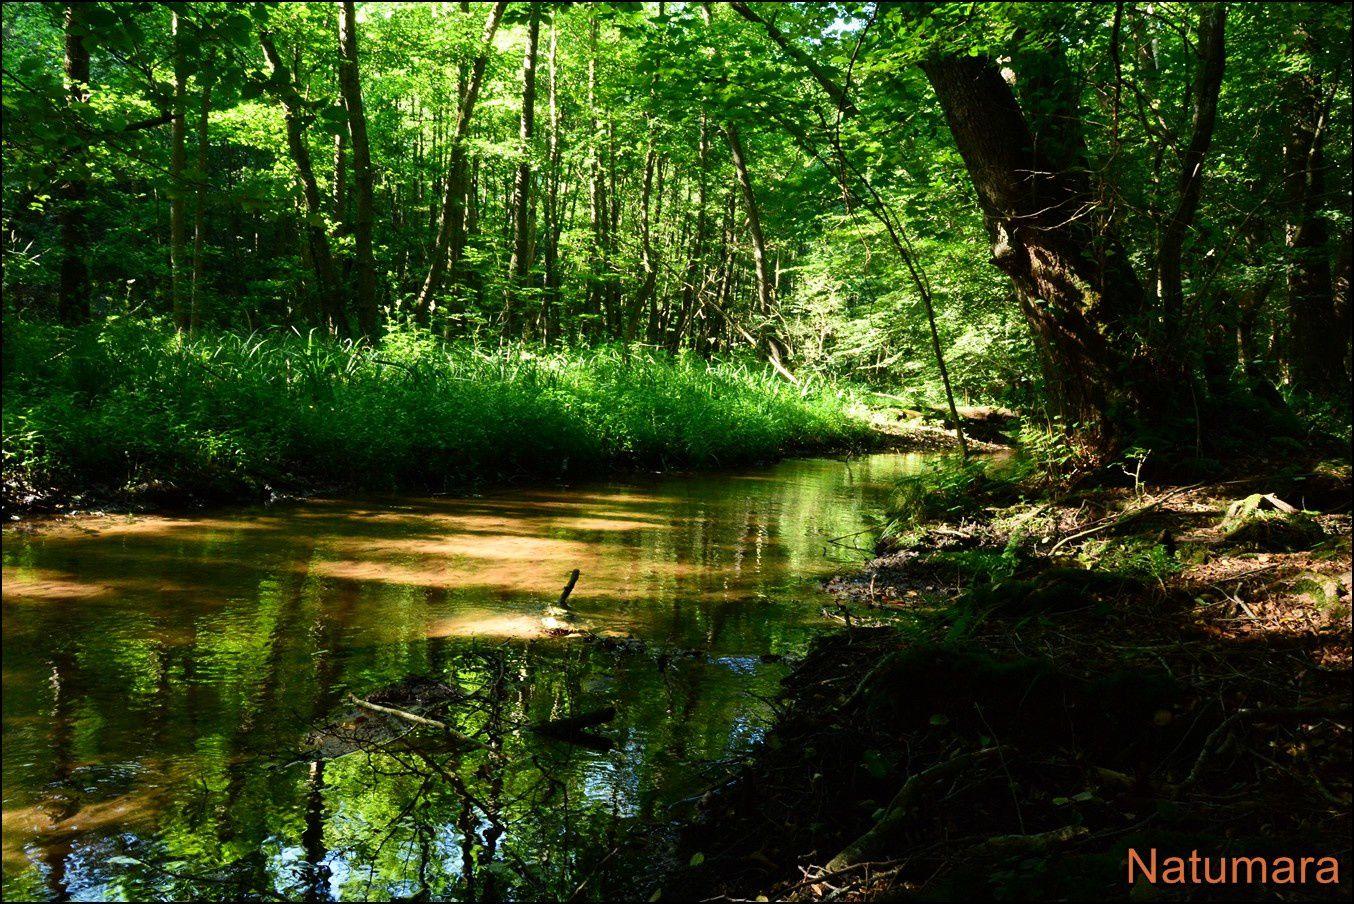 Précieuses Aulnaies marécageuses : vallée du Niederbaechel